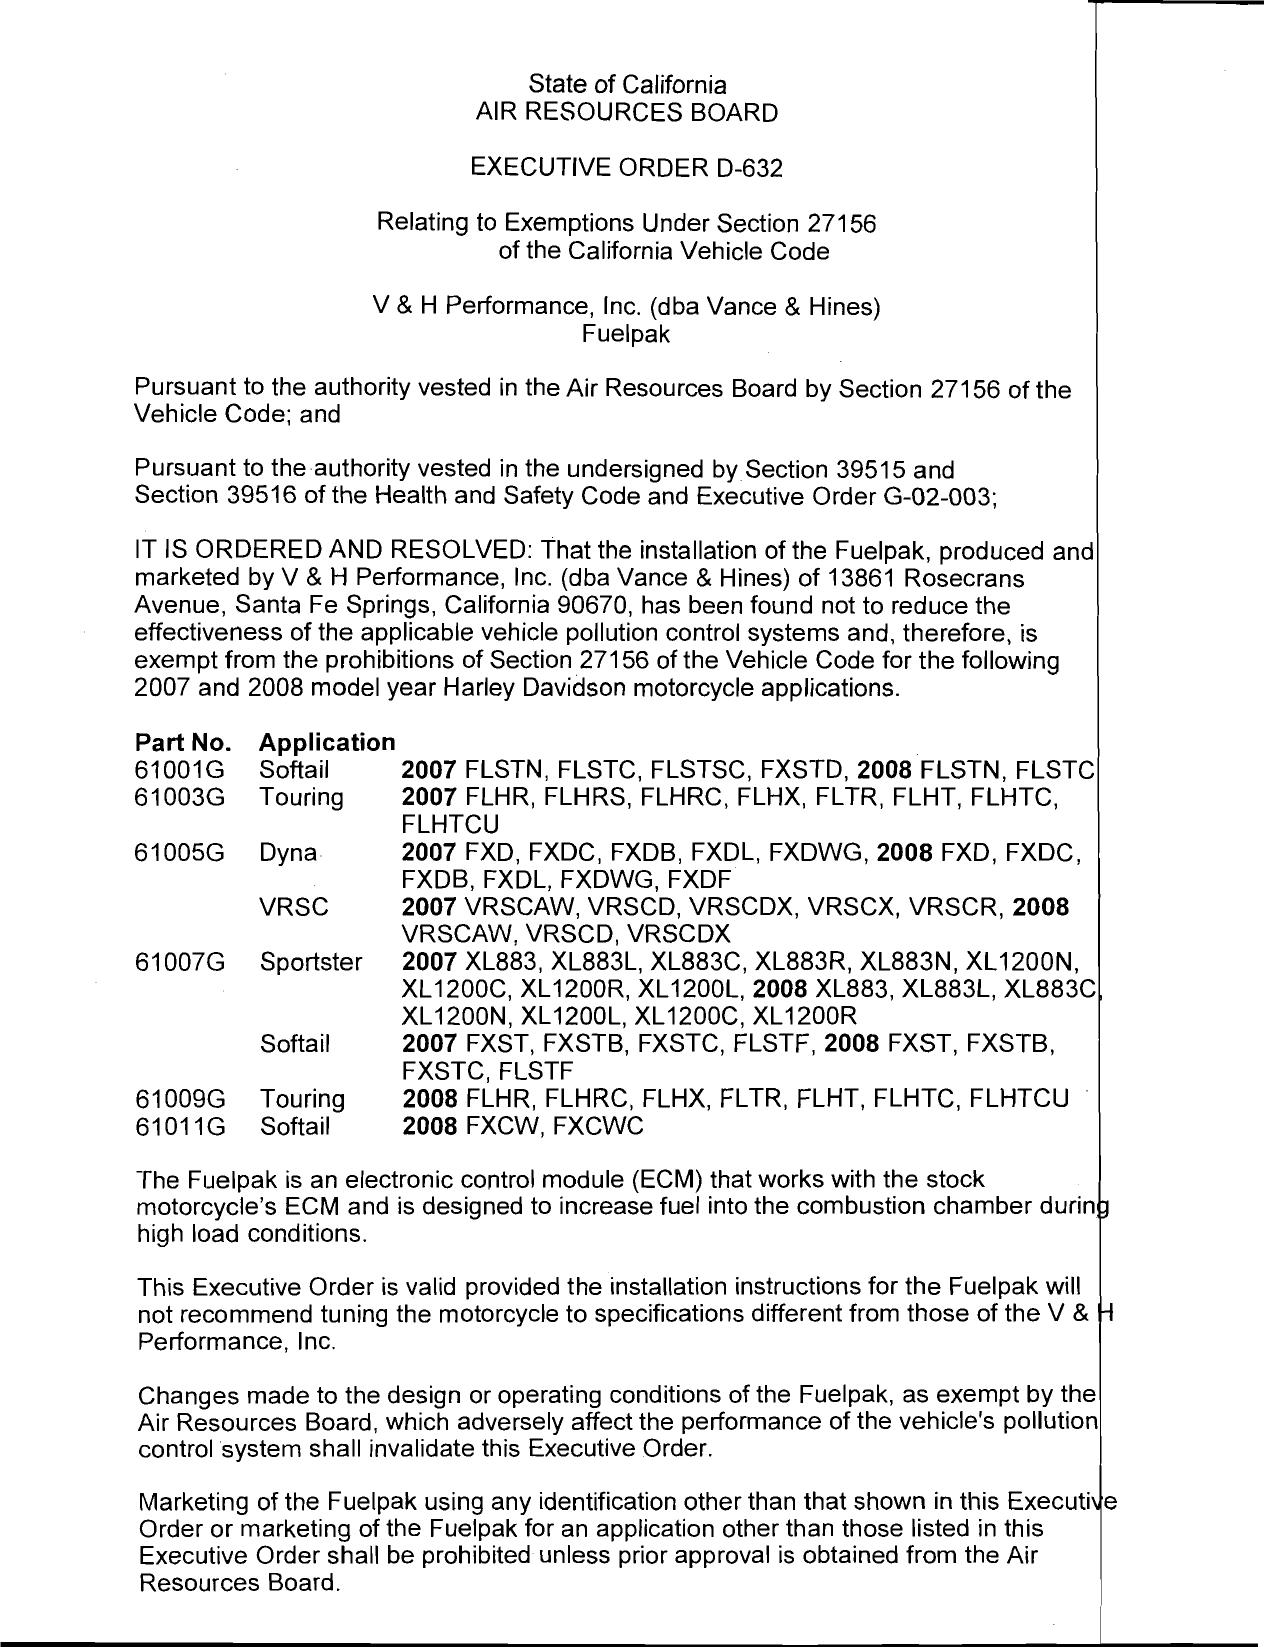 Executive Order D-632 V&H Performance (aka Vance & Hines)